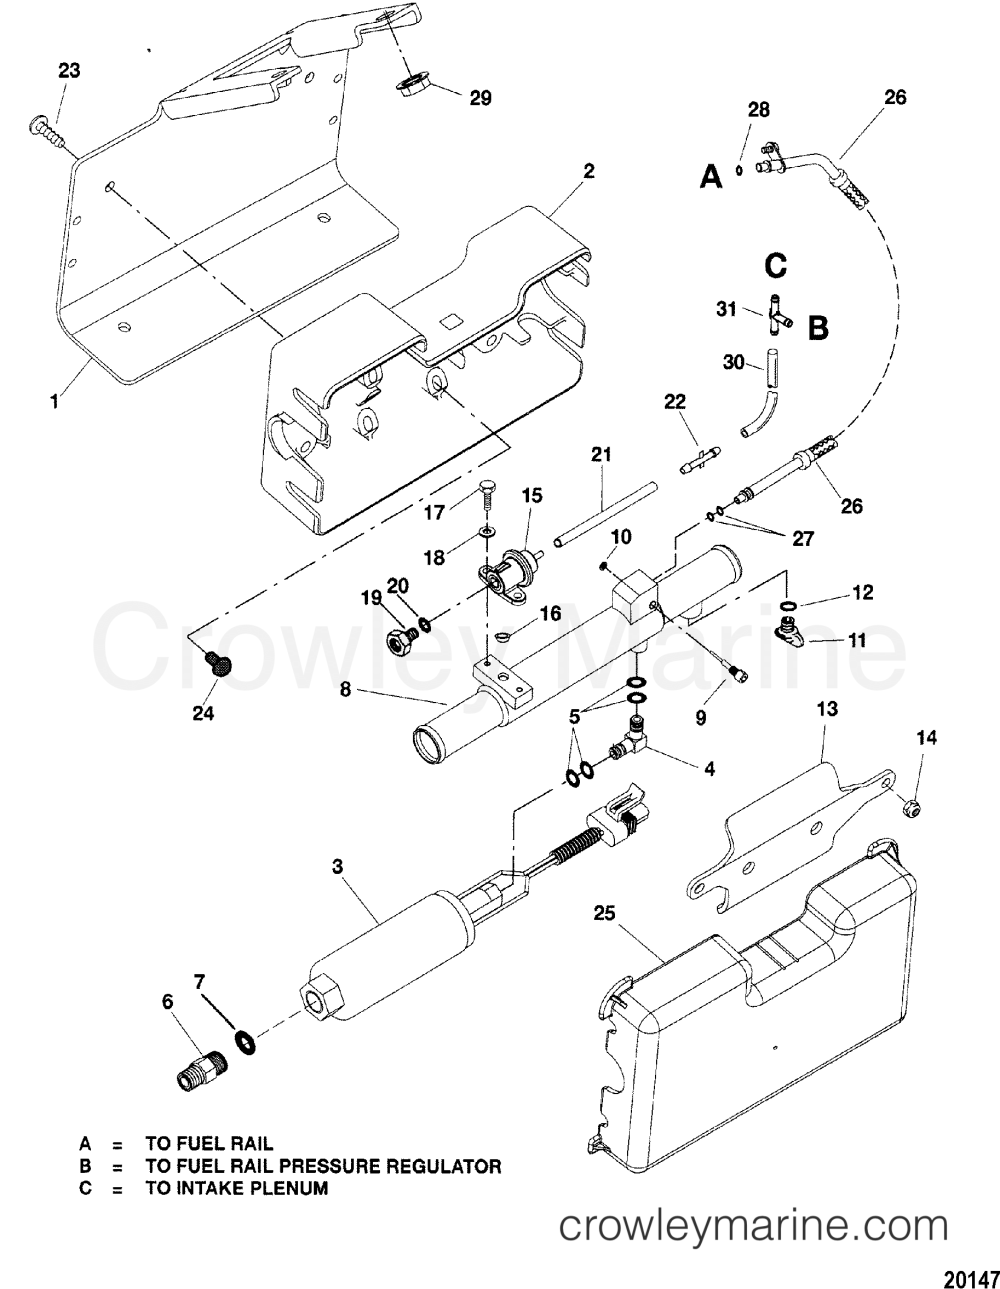 medium resolution of mercruiser 140 trim wiring diagram iboats mercruiser 3 0 bravo 1 outdrive parts diagram mercruiser alpha one outdrive diagram